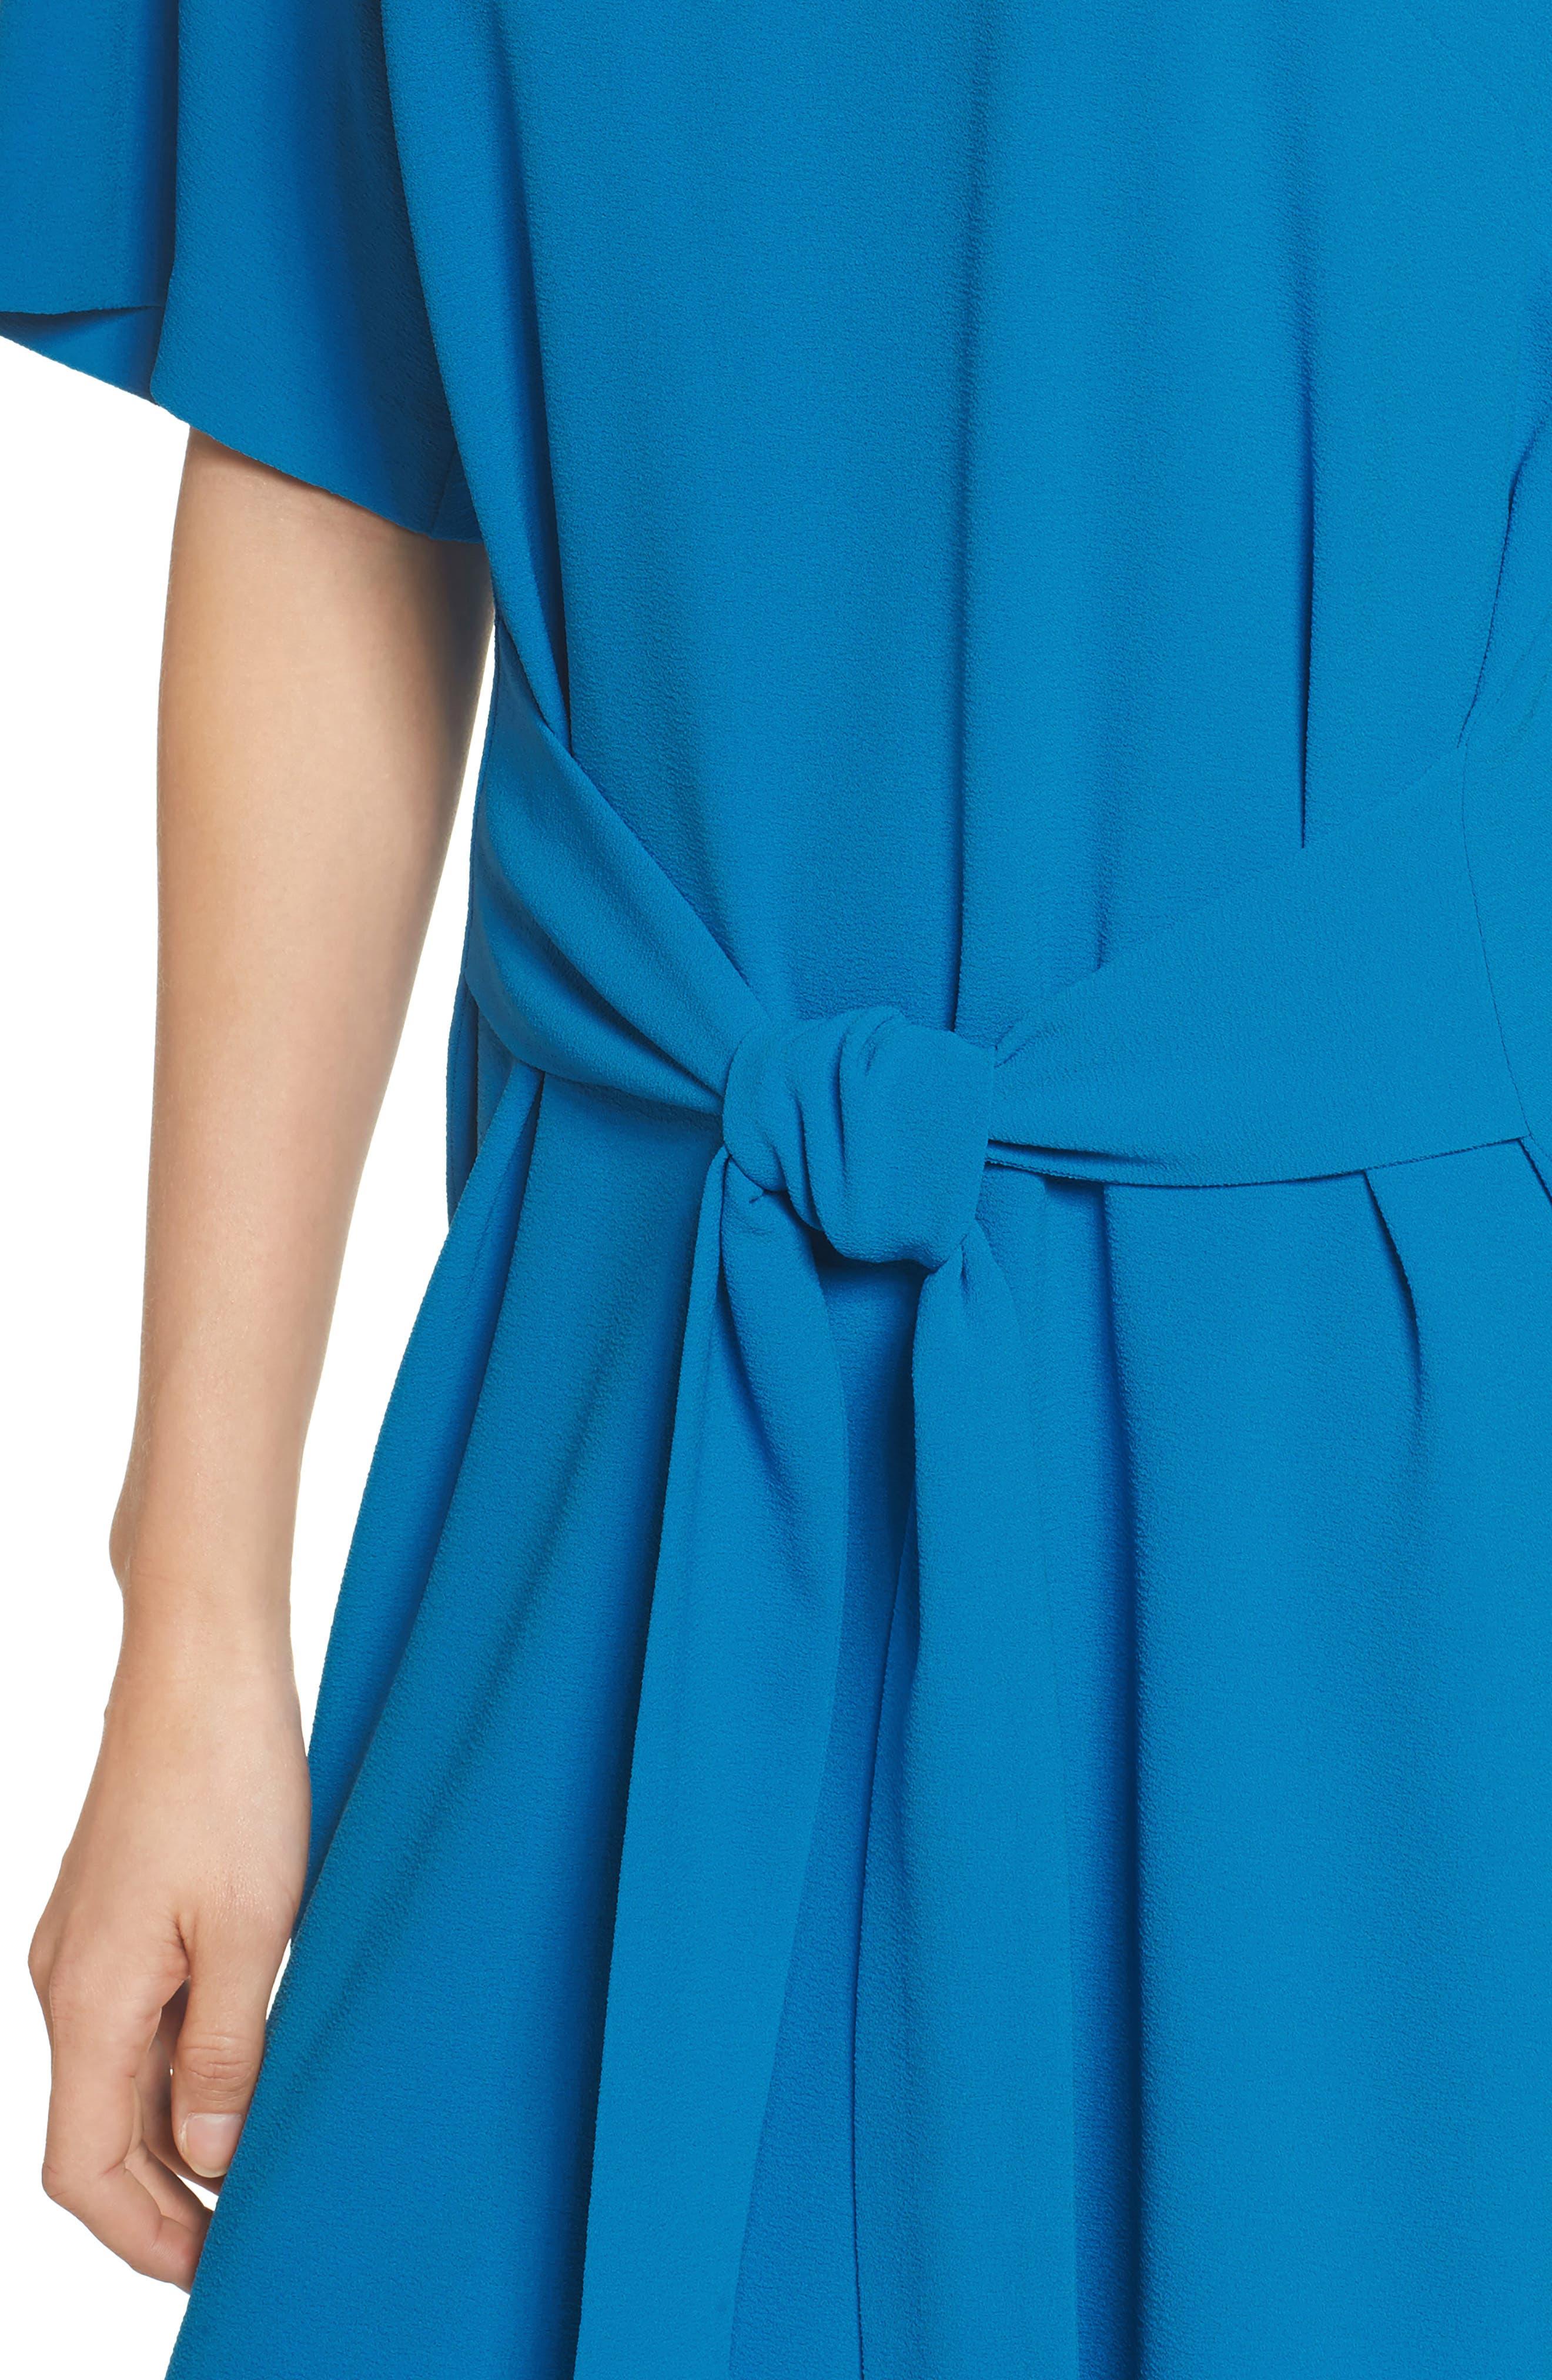 Dara Shift Dress,                             Alternate thumbnail 15, color,